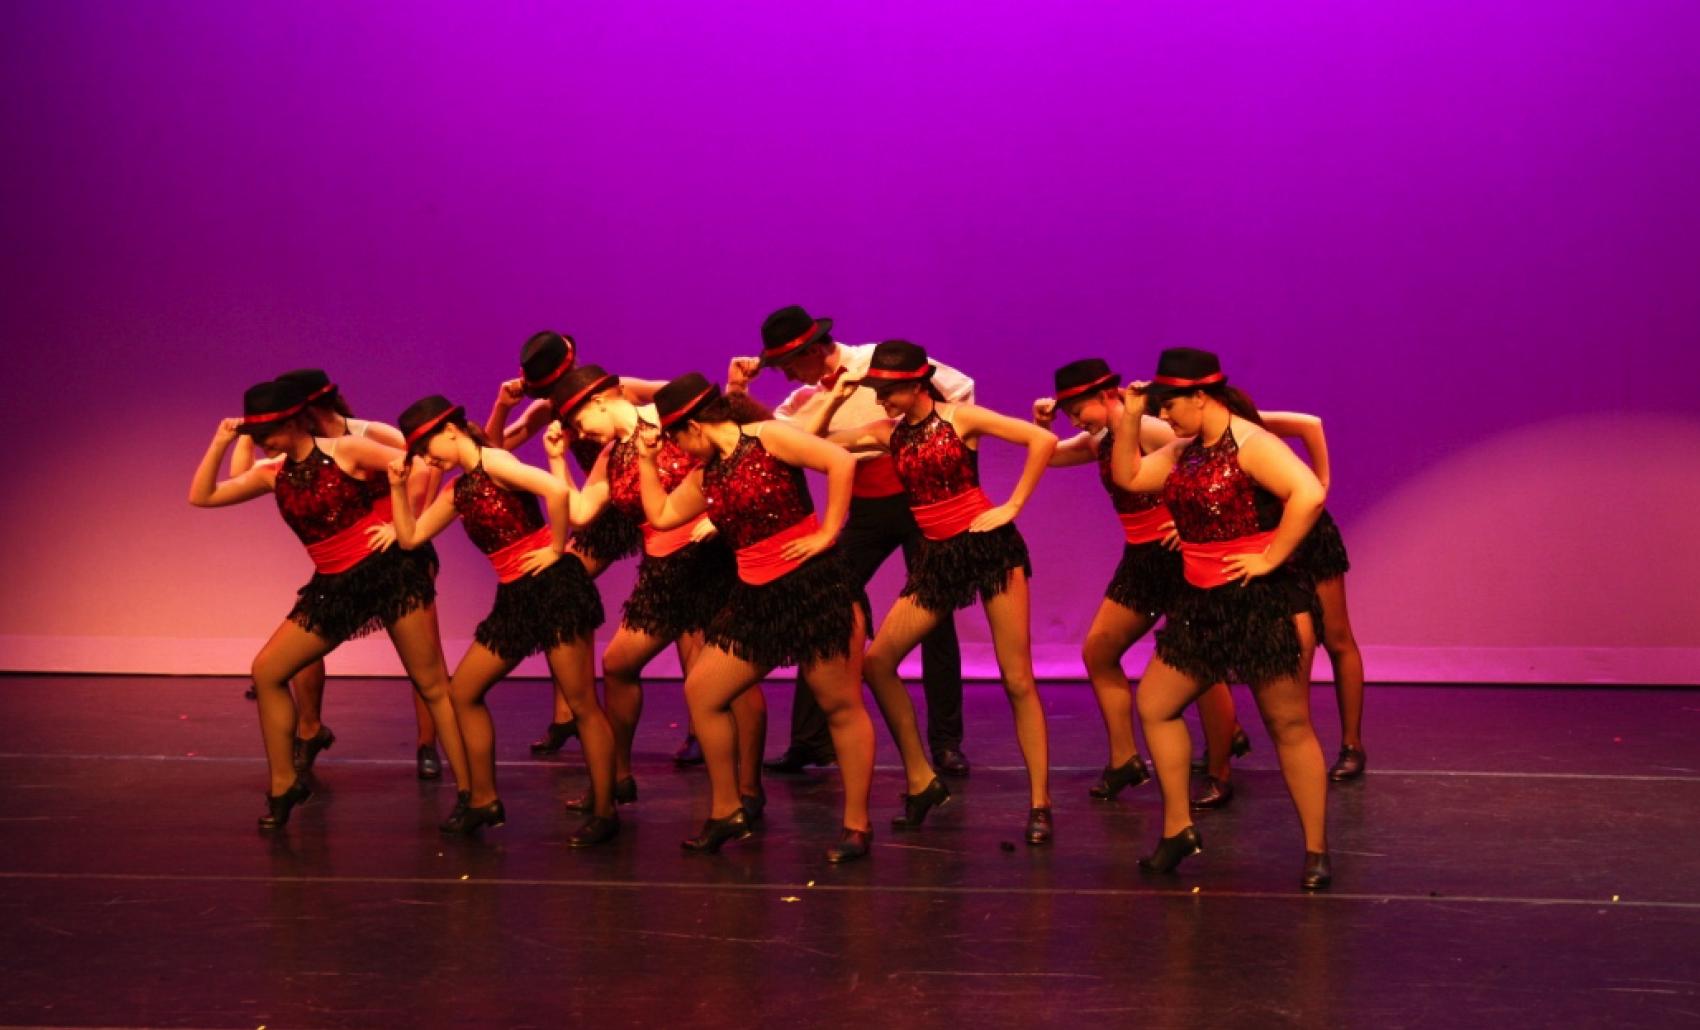 Summer - Sawnee School of Ballet